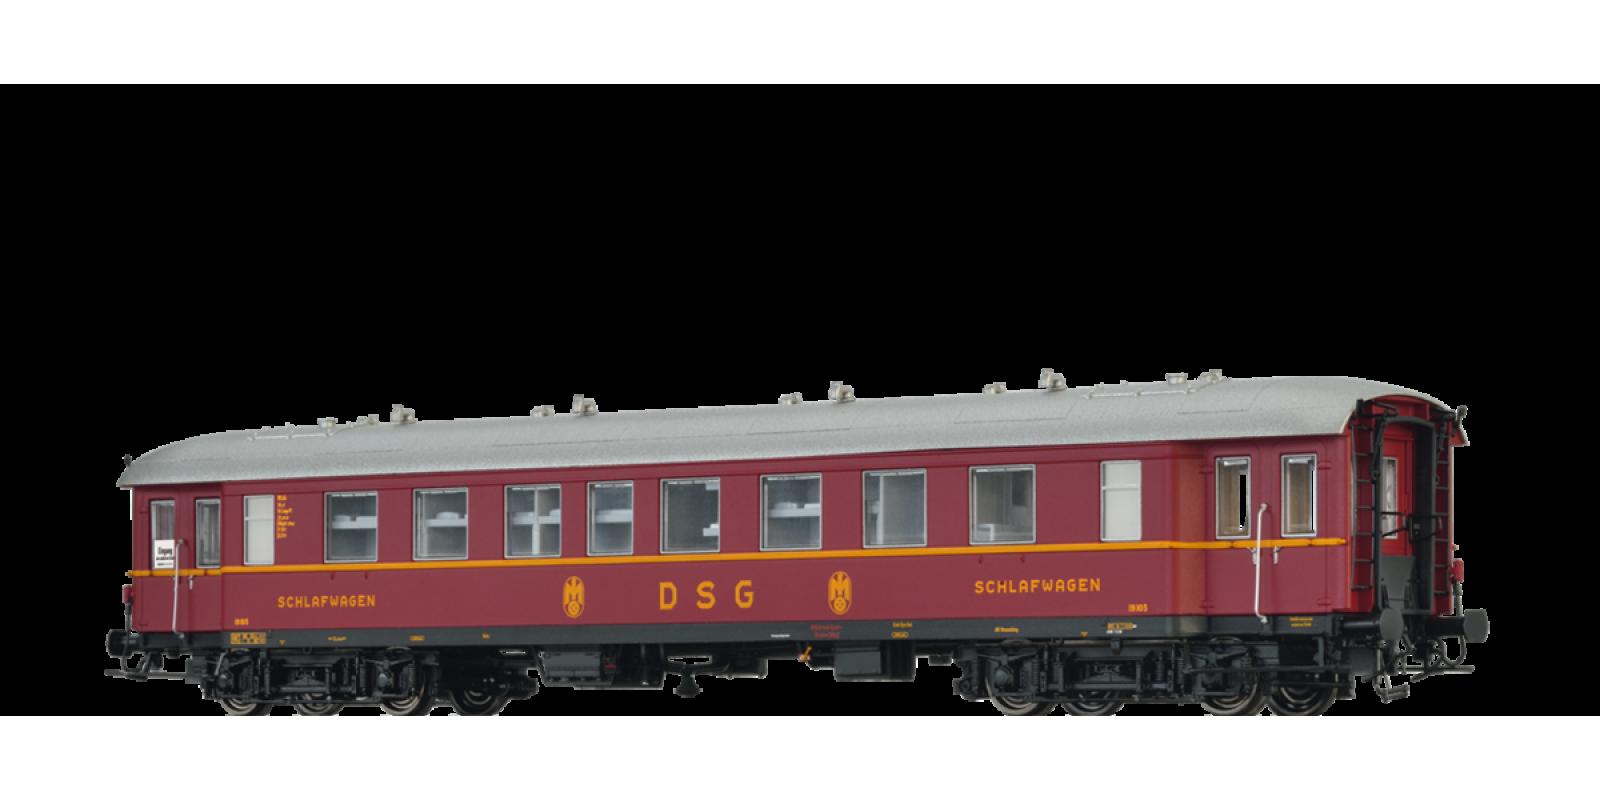 BR46414 Sleeping Coach WL4ü-36/50 DSG